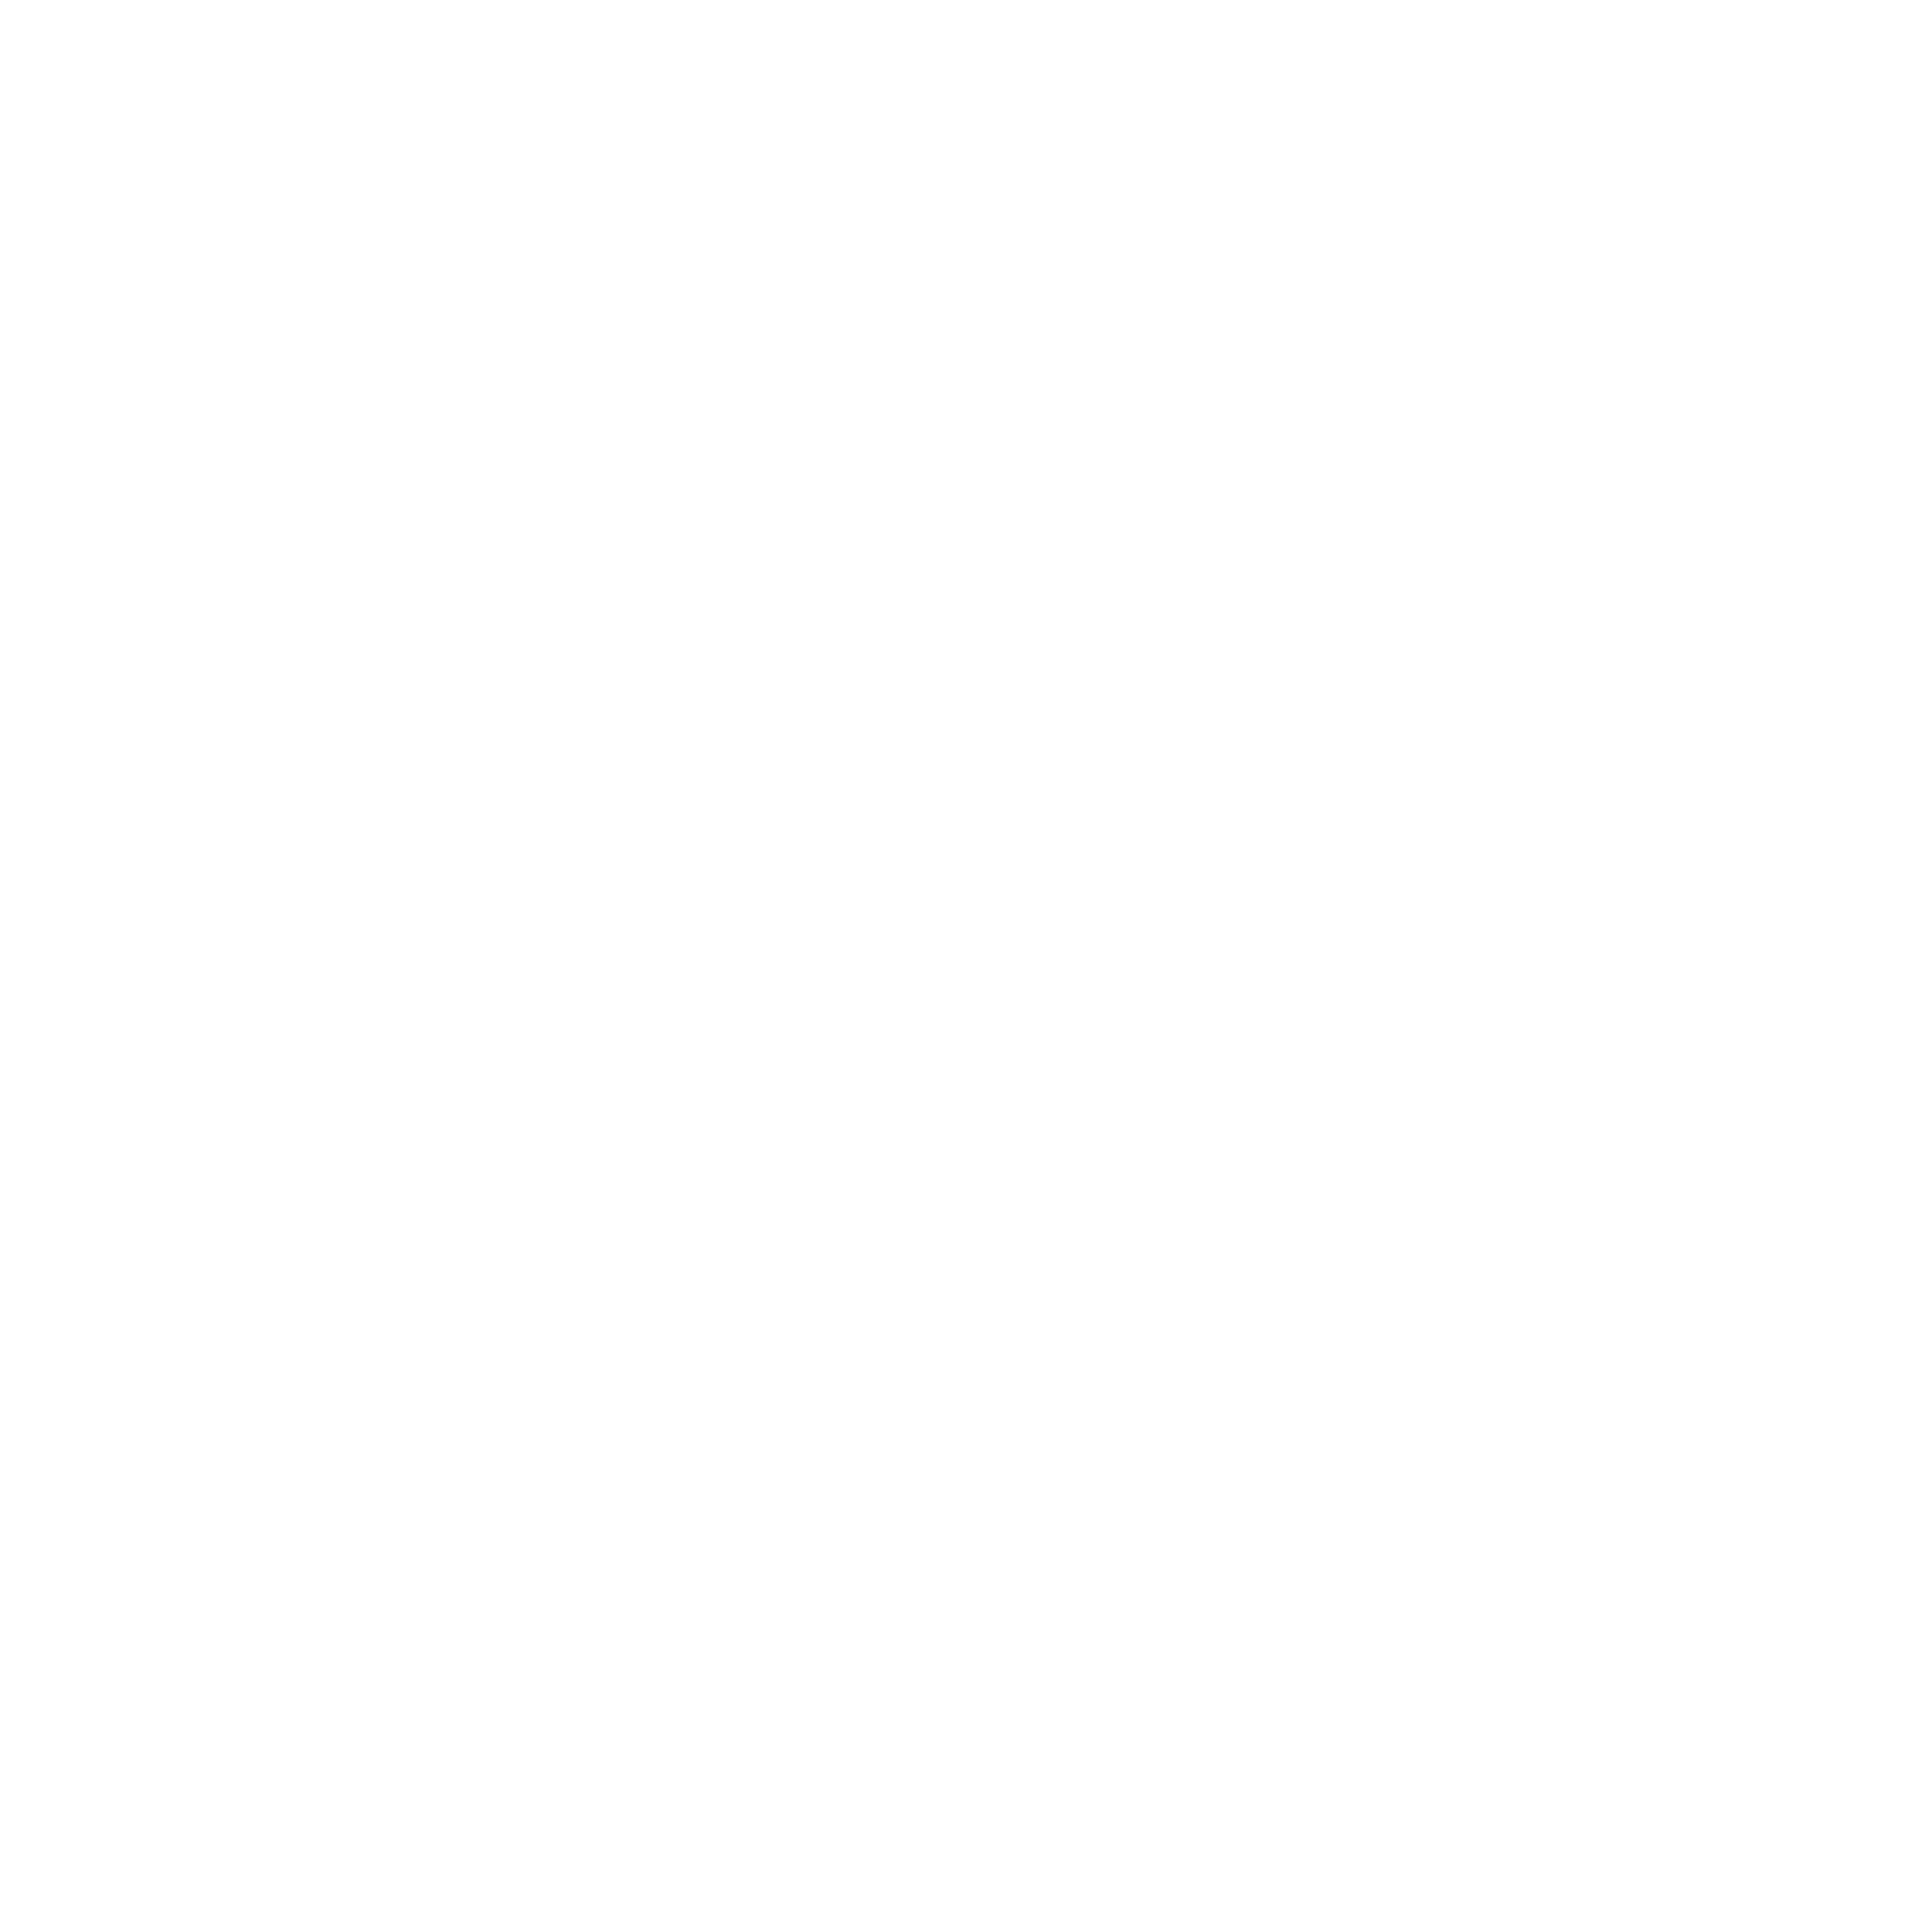 Video De Wachter 2017